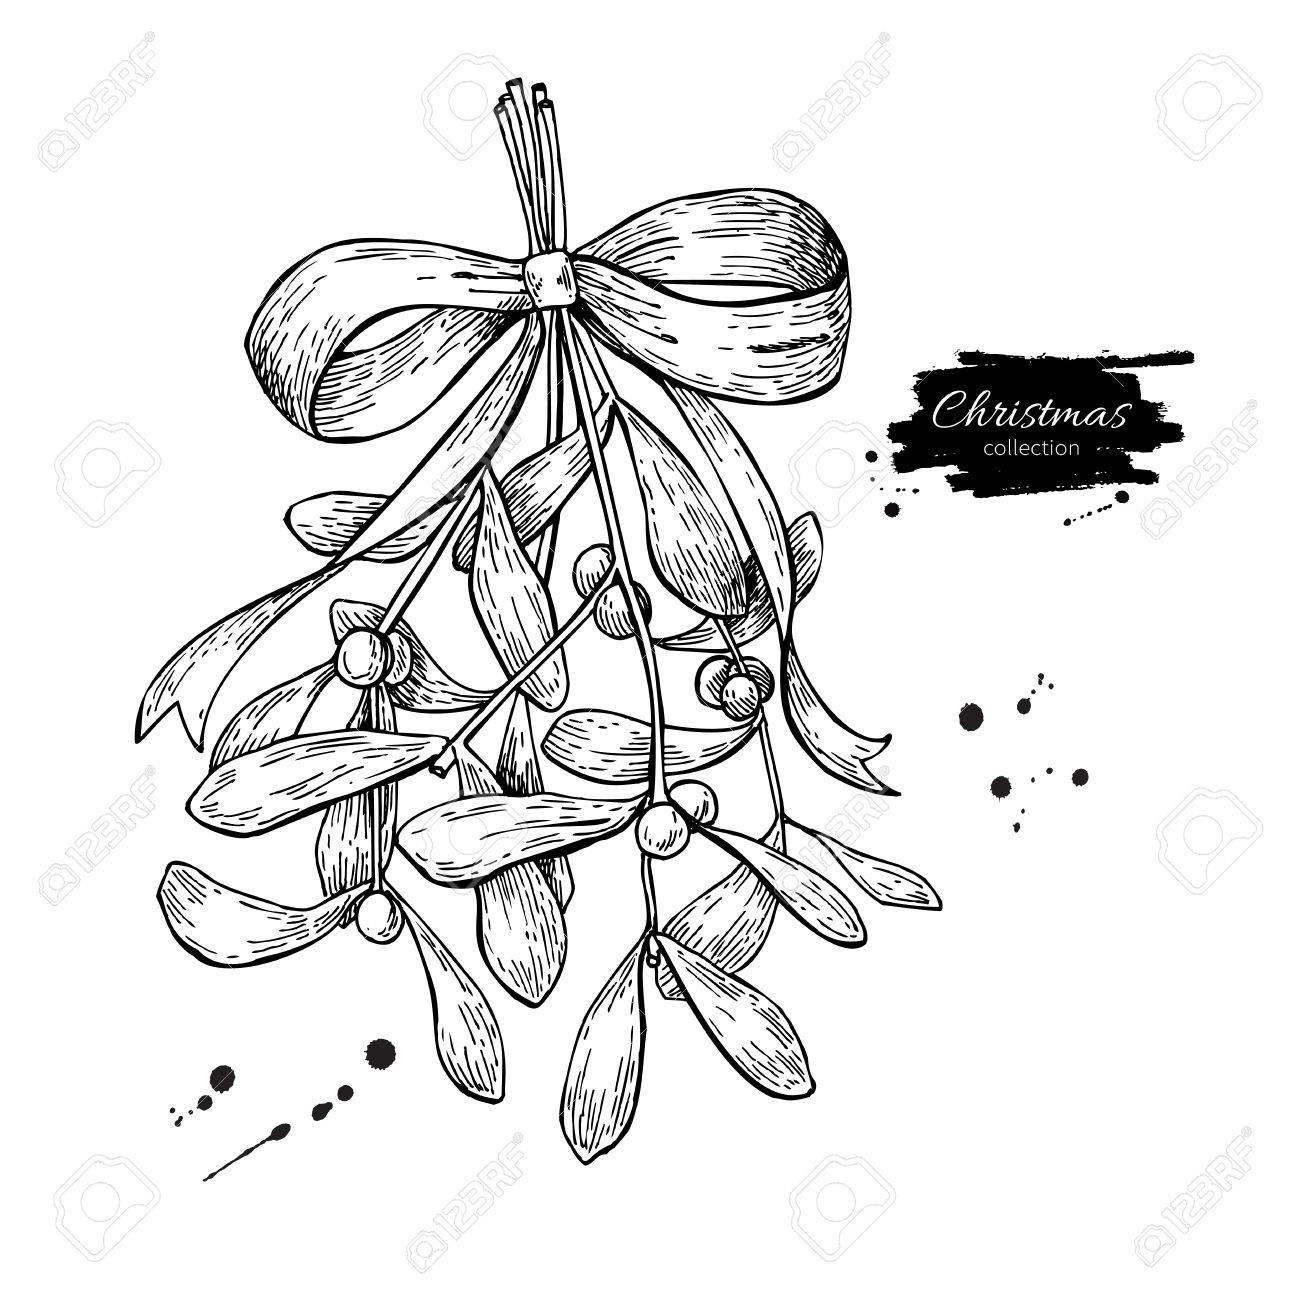 Mistletoe With Bow And Ribbon Christmas Decor Plant Hand Drawn Vector Illustration Botanical